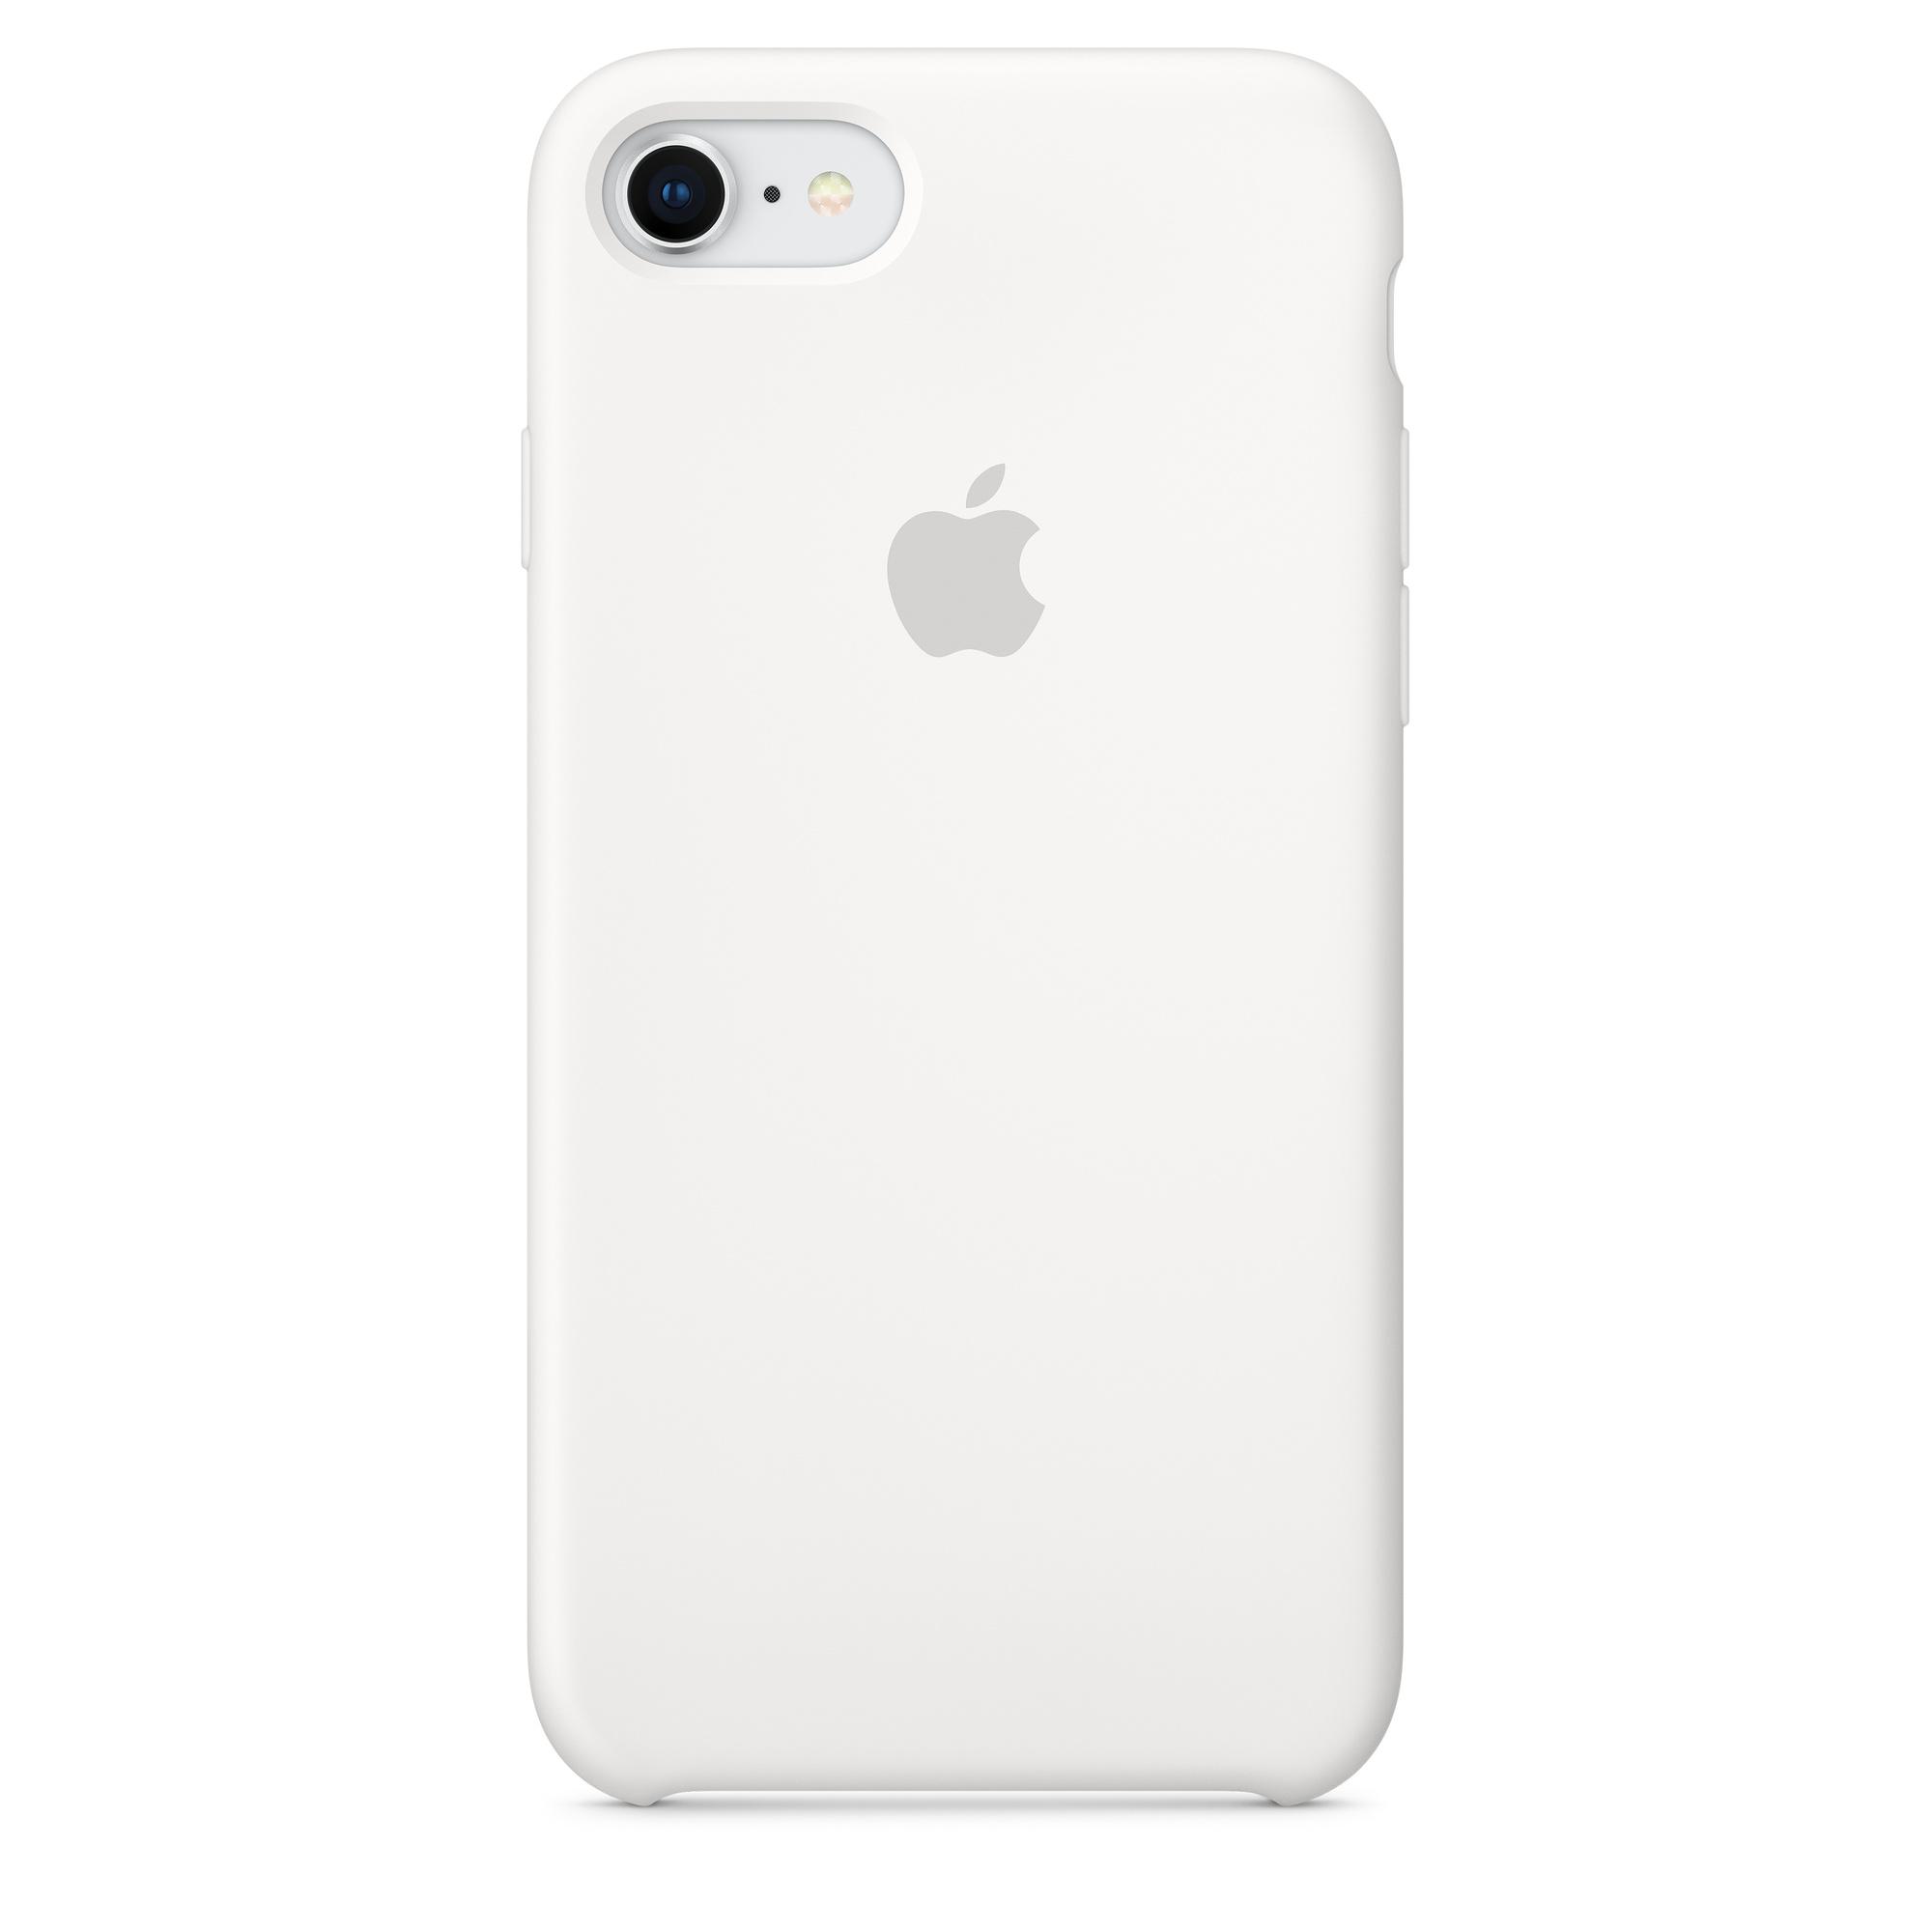 best service 2e908 ef421 iPhone 8 / 7 Silicone Case - White